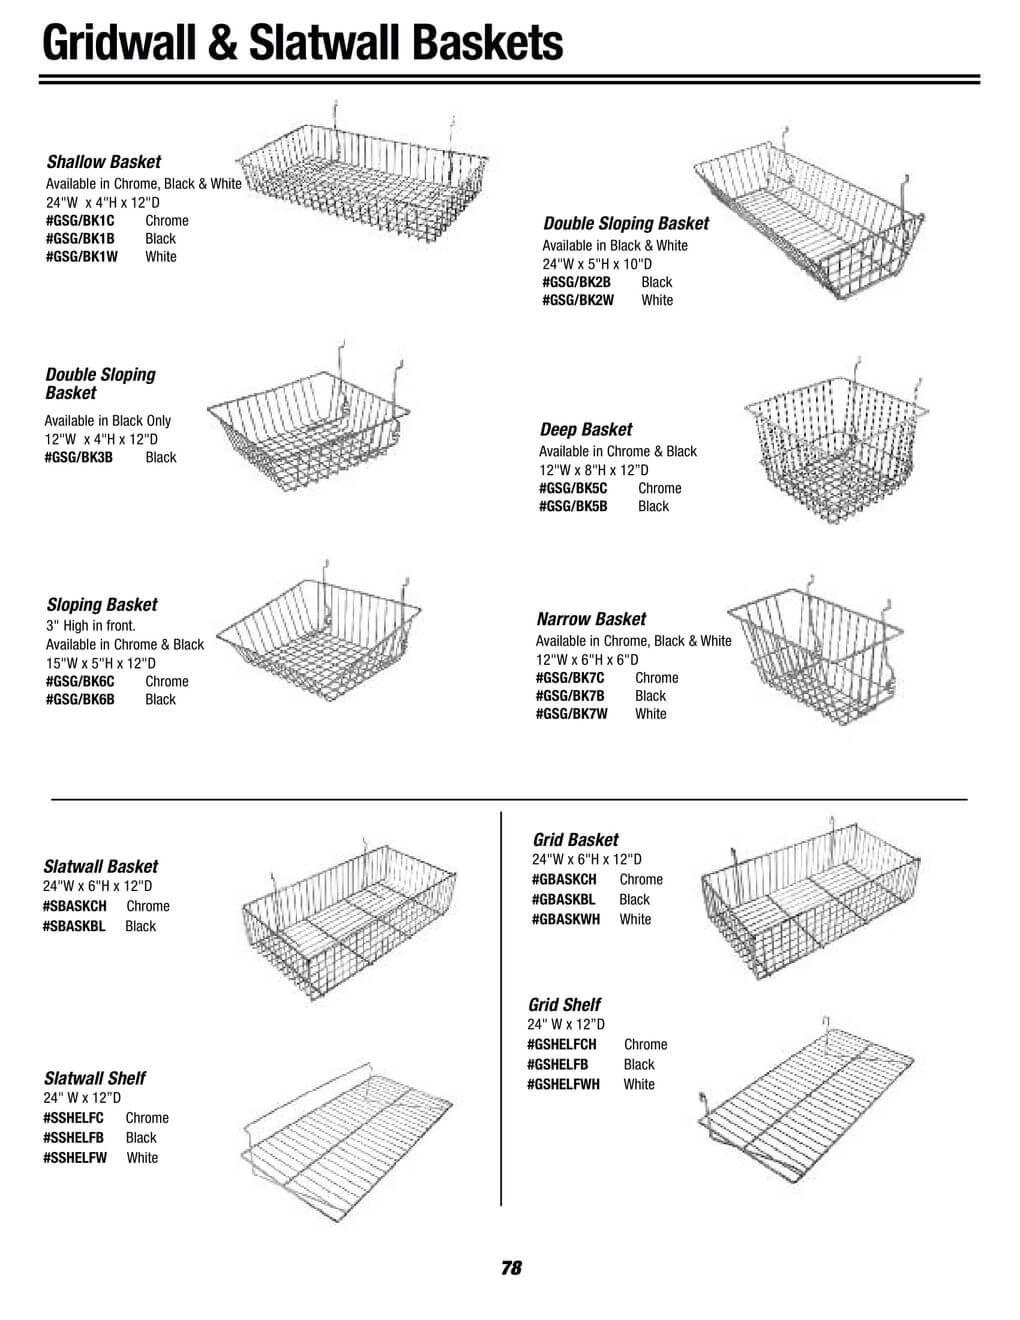 gridwall and slatwall baskets